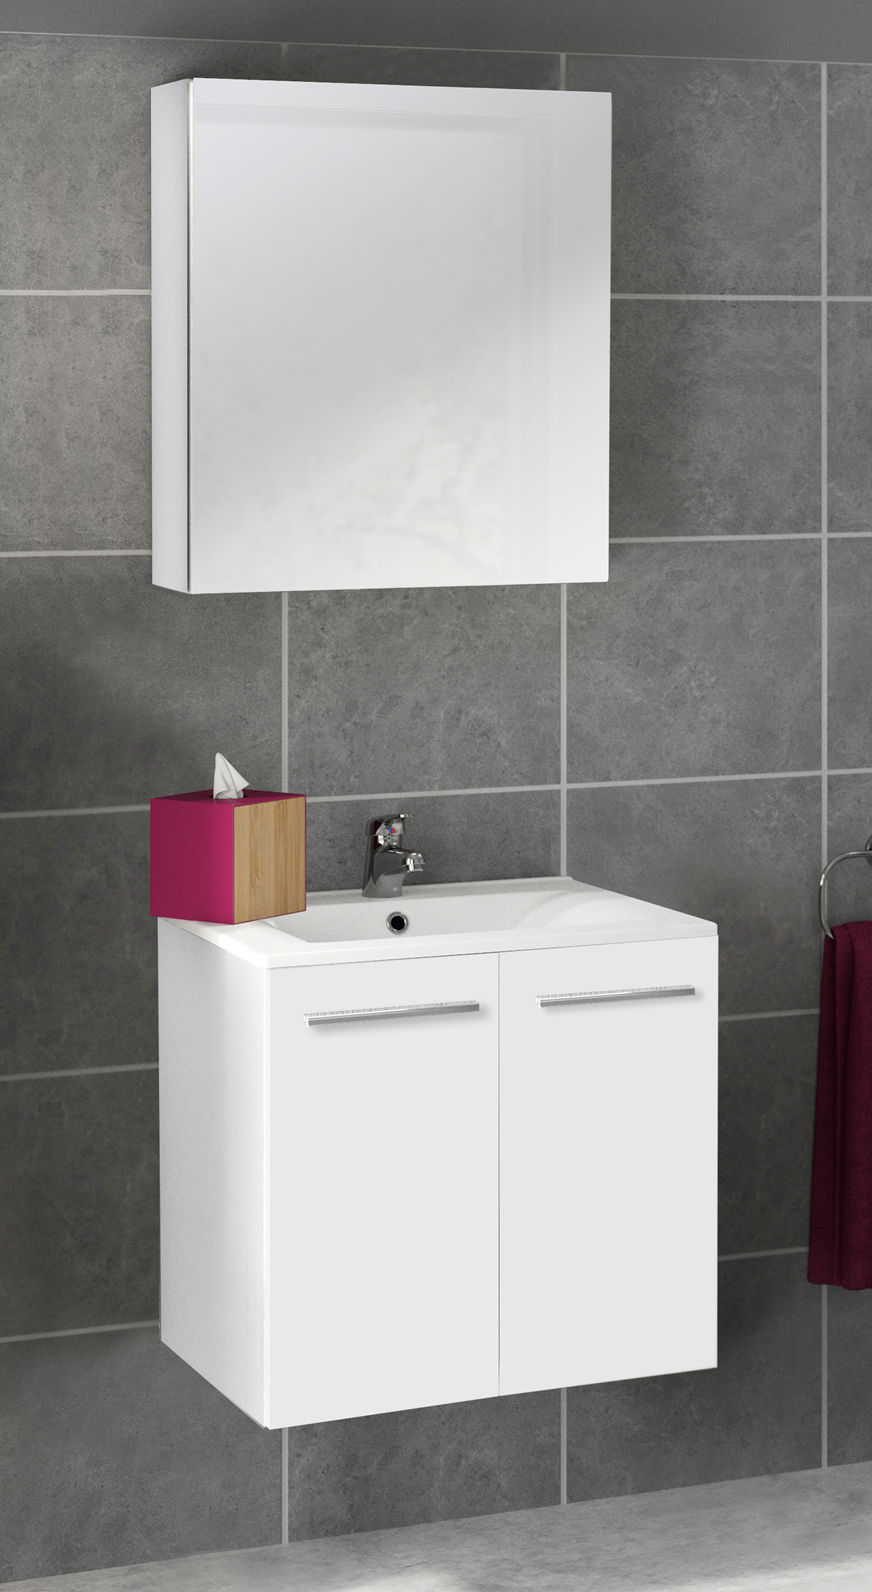 meuble sous vasque 2 portes 60 cm s rie adesio 3. Black Bedroom Furniture Sets. Home Design Ideas